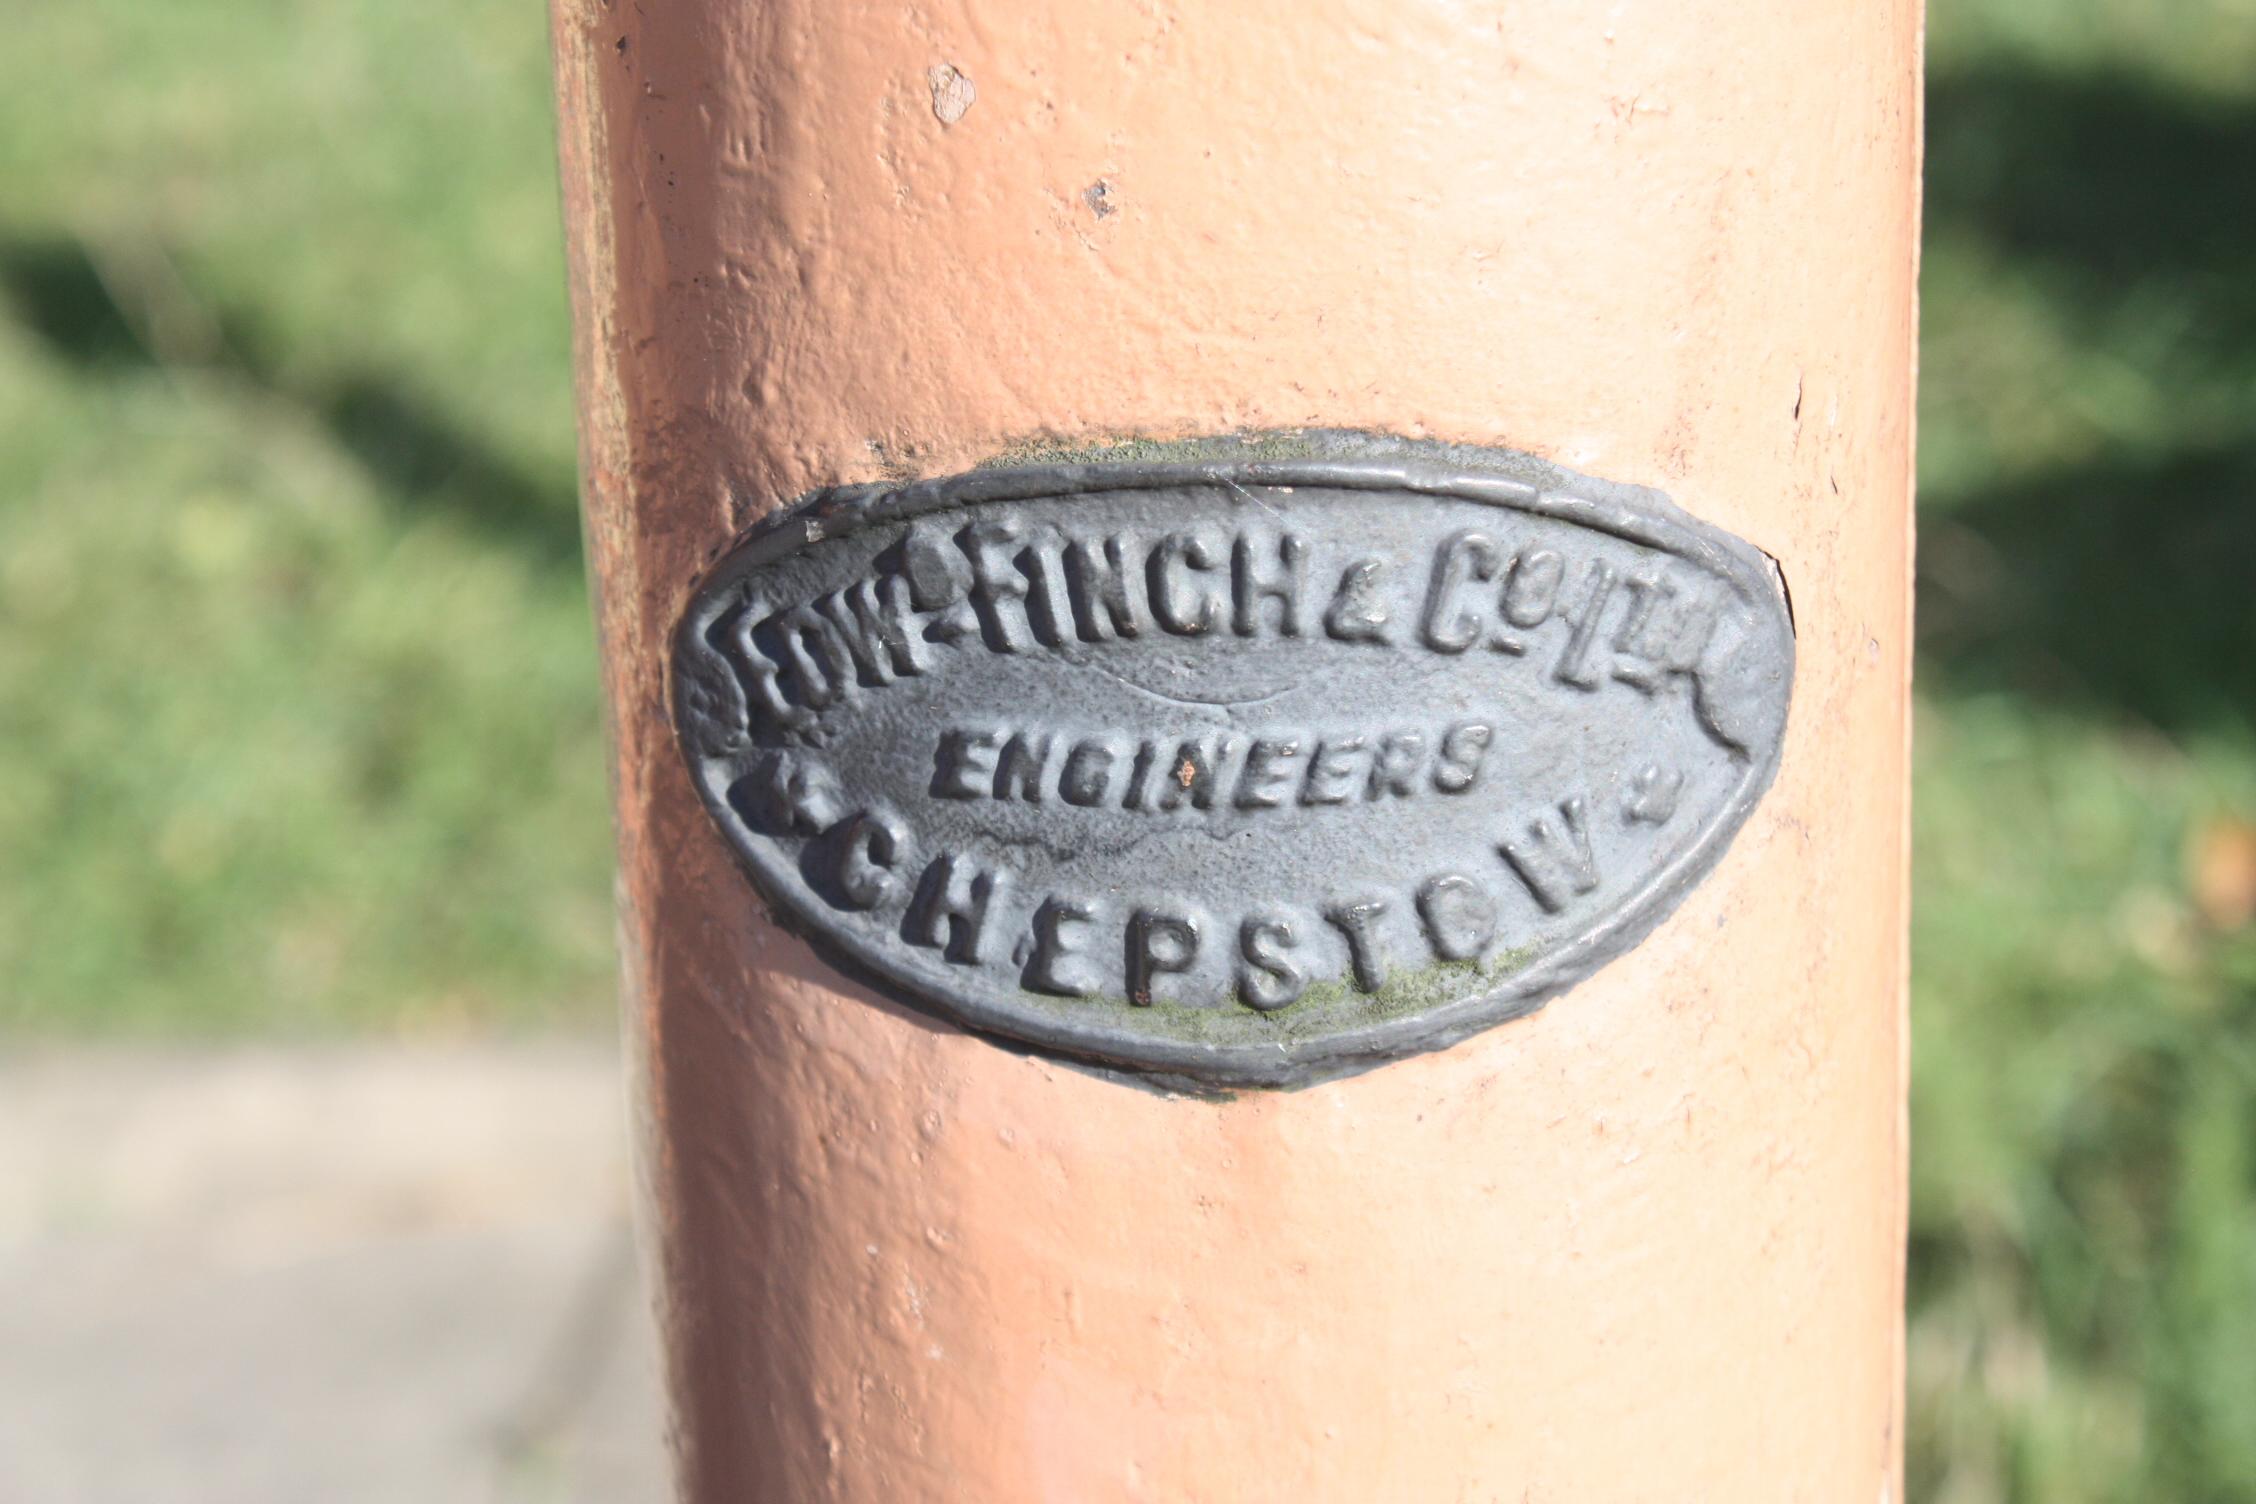 Edward Finch & Co. (Engineers)